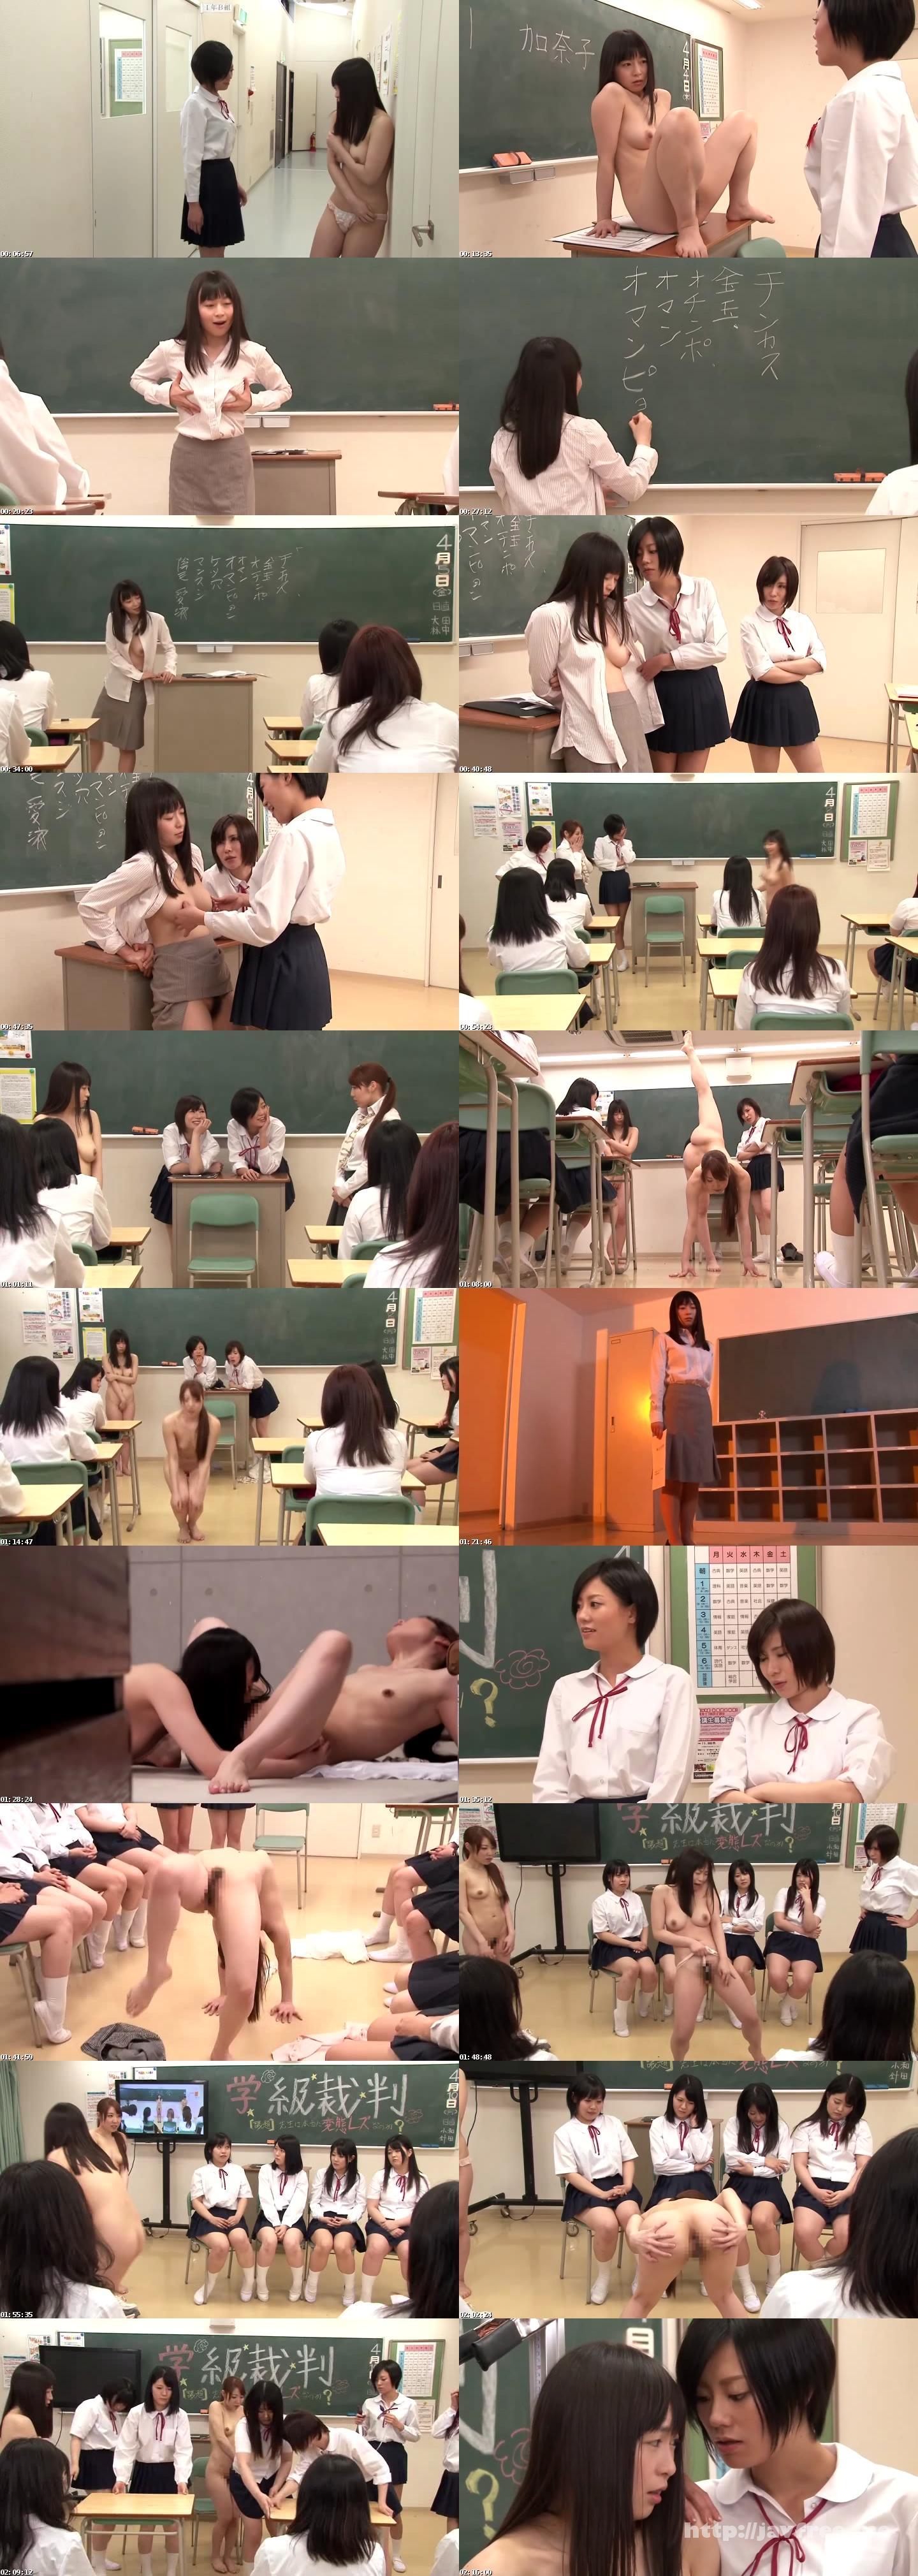 [RCT 596] 私立花園女子校いじめ学級会シーズン2 先生の変態レズ疑惑!学級裁判編 羽月希 琥珀うた 内村りな RCT